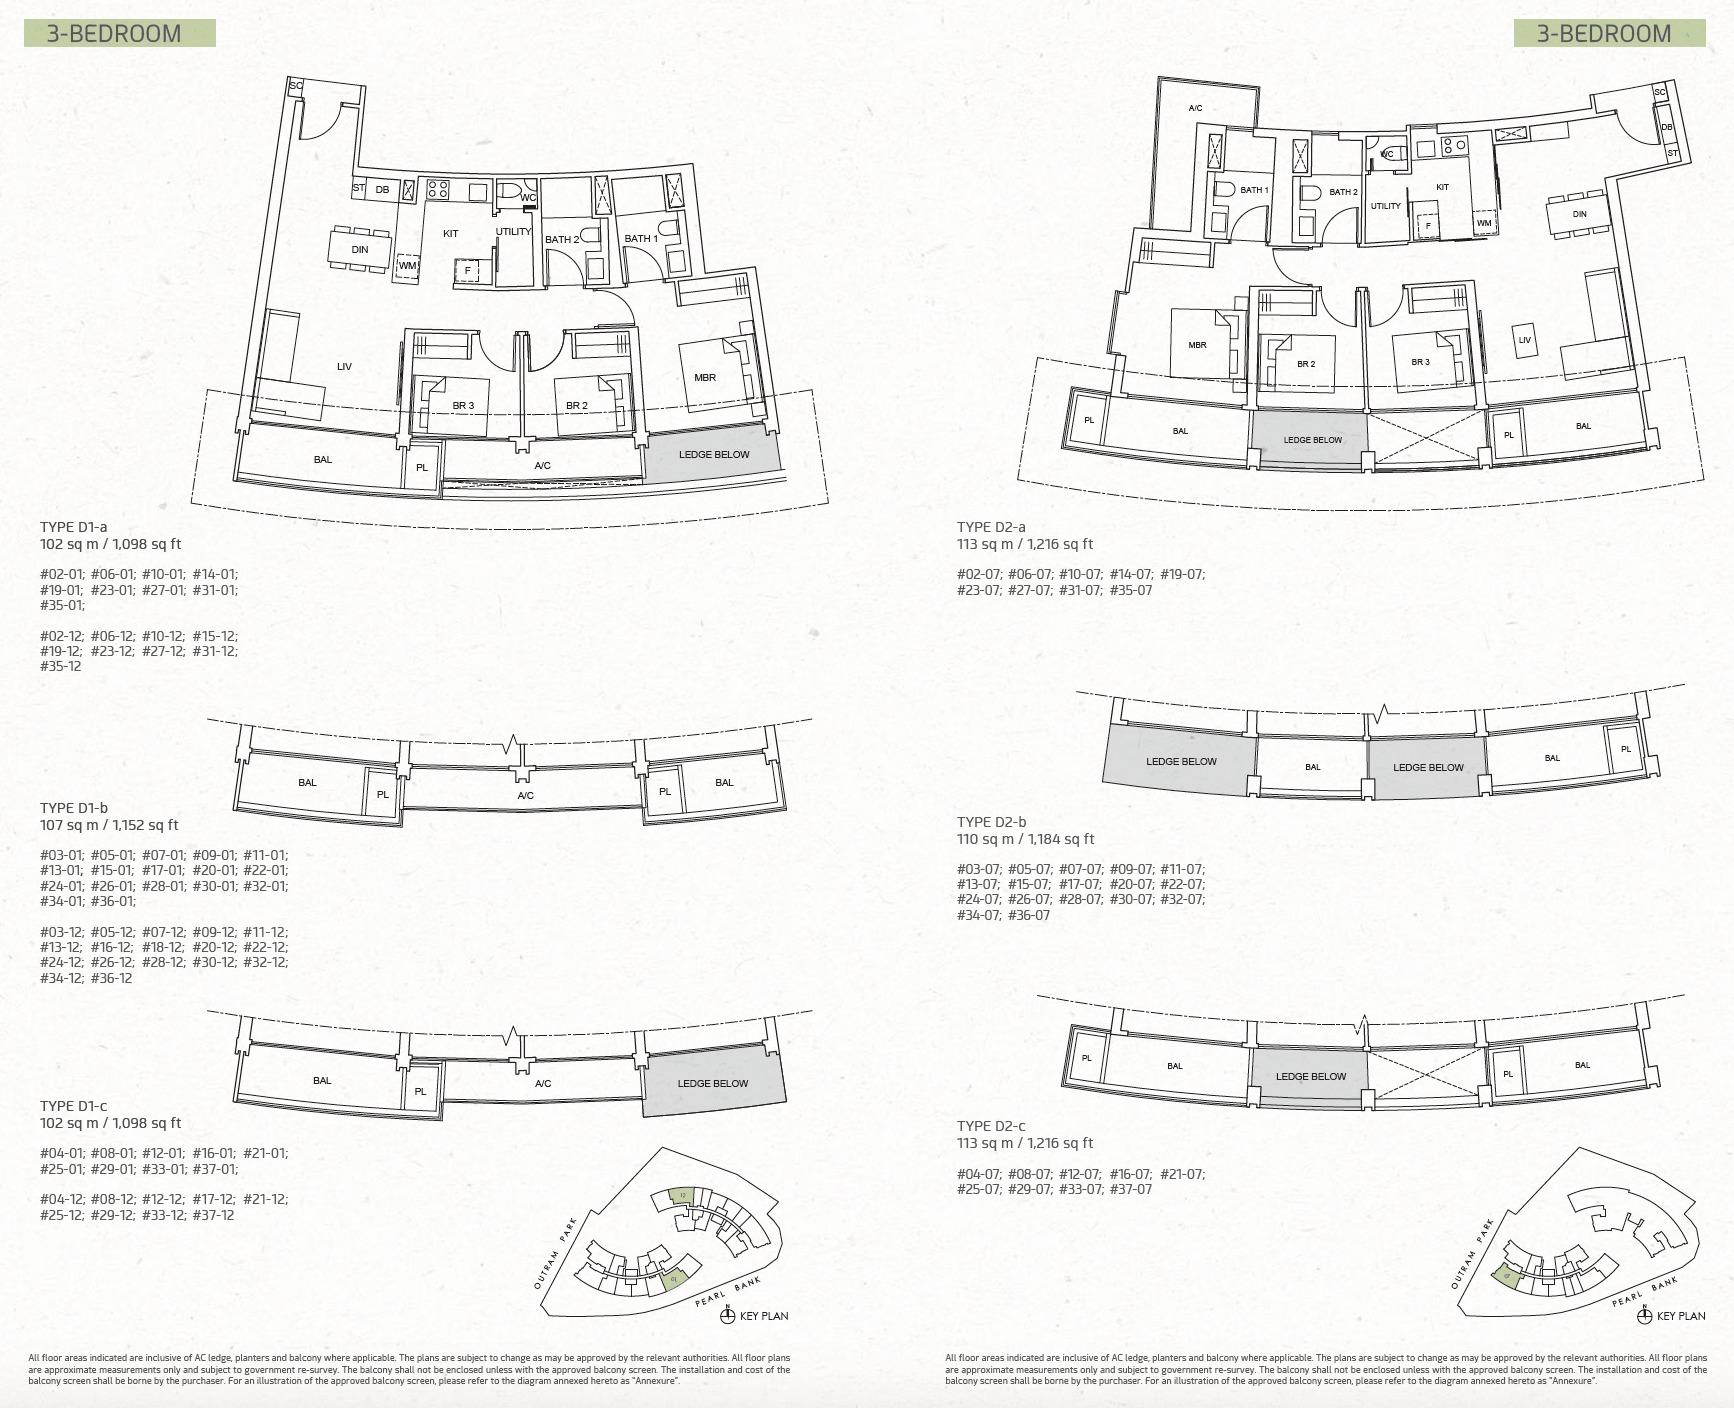 One-Pearl-Bank-floor-plan-3-bedroom